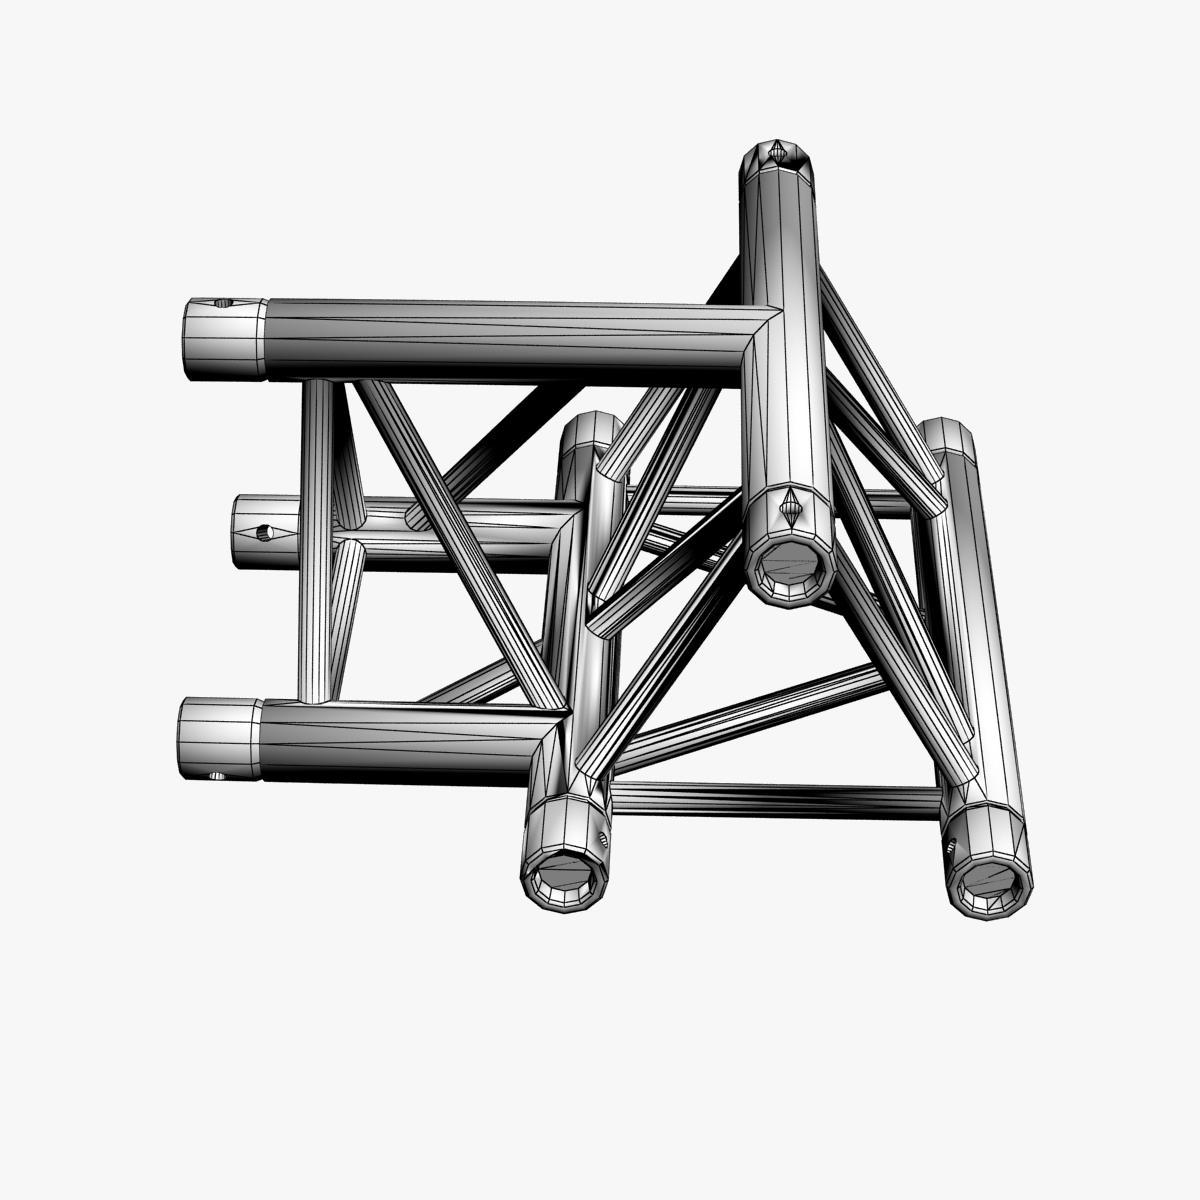 triangular trusses (collection 55 modular pieces) 3d model 3ds max dxf fbx c4d dae texture obj 216220